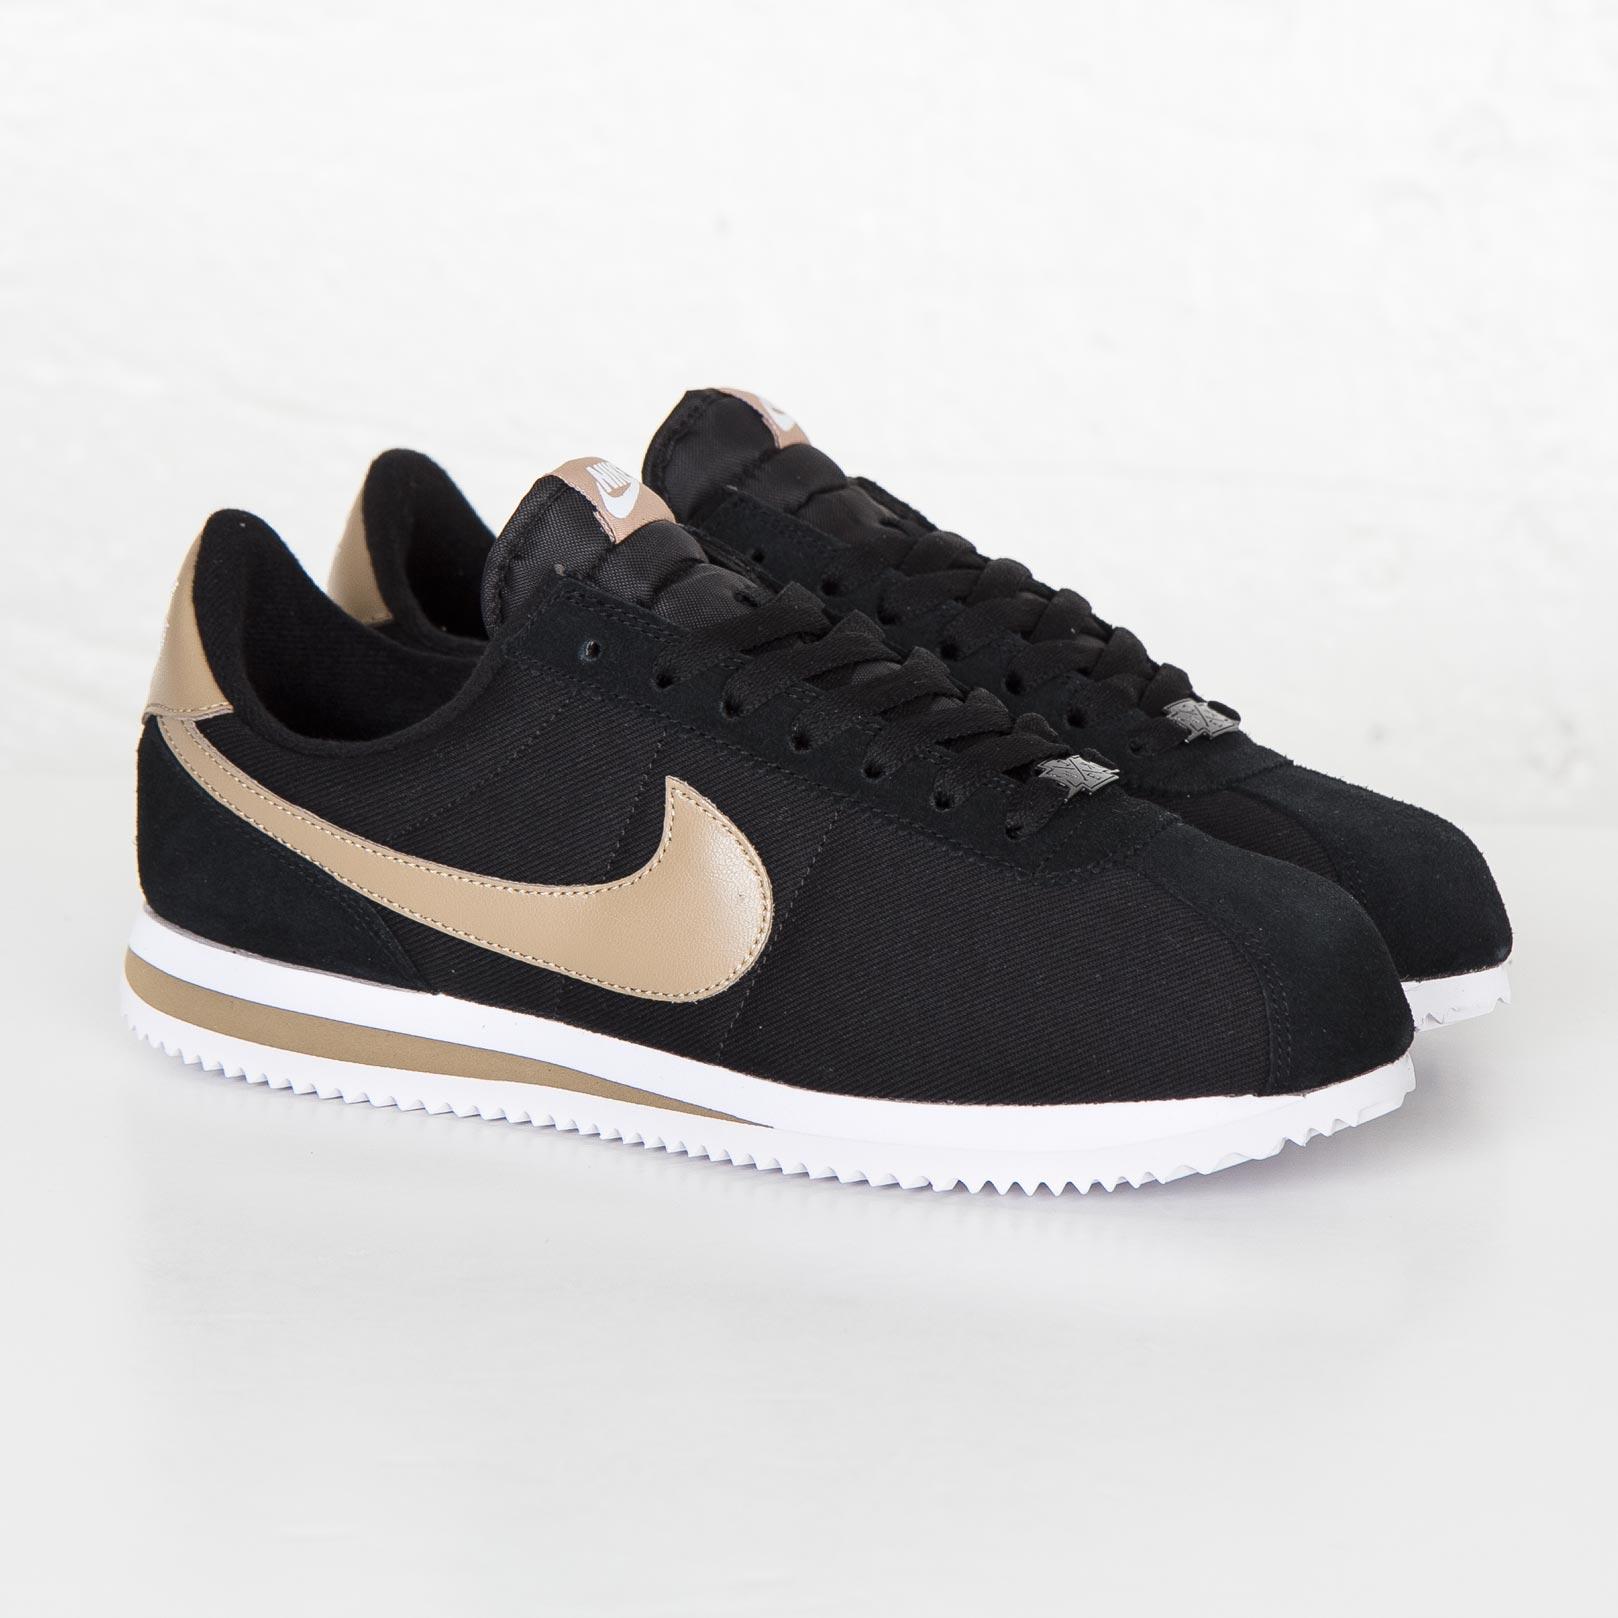 official photos 36c0d eea7b Nike Cortez Basic Premium QS